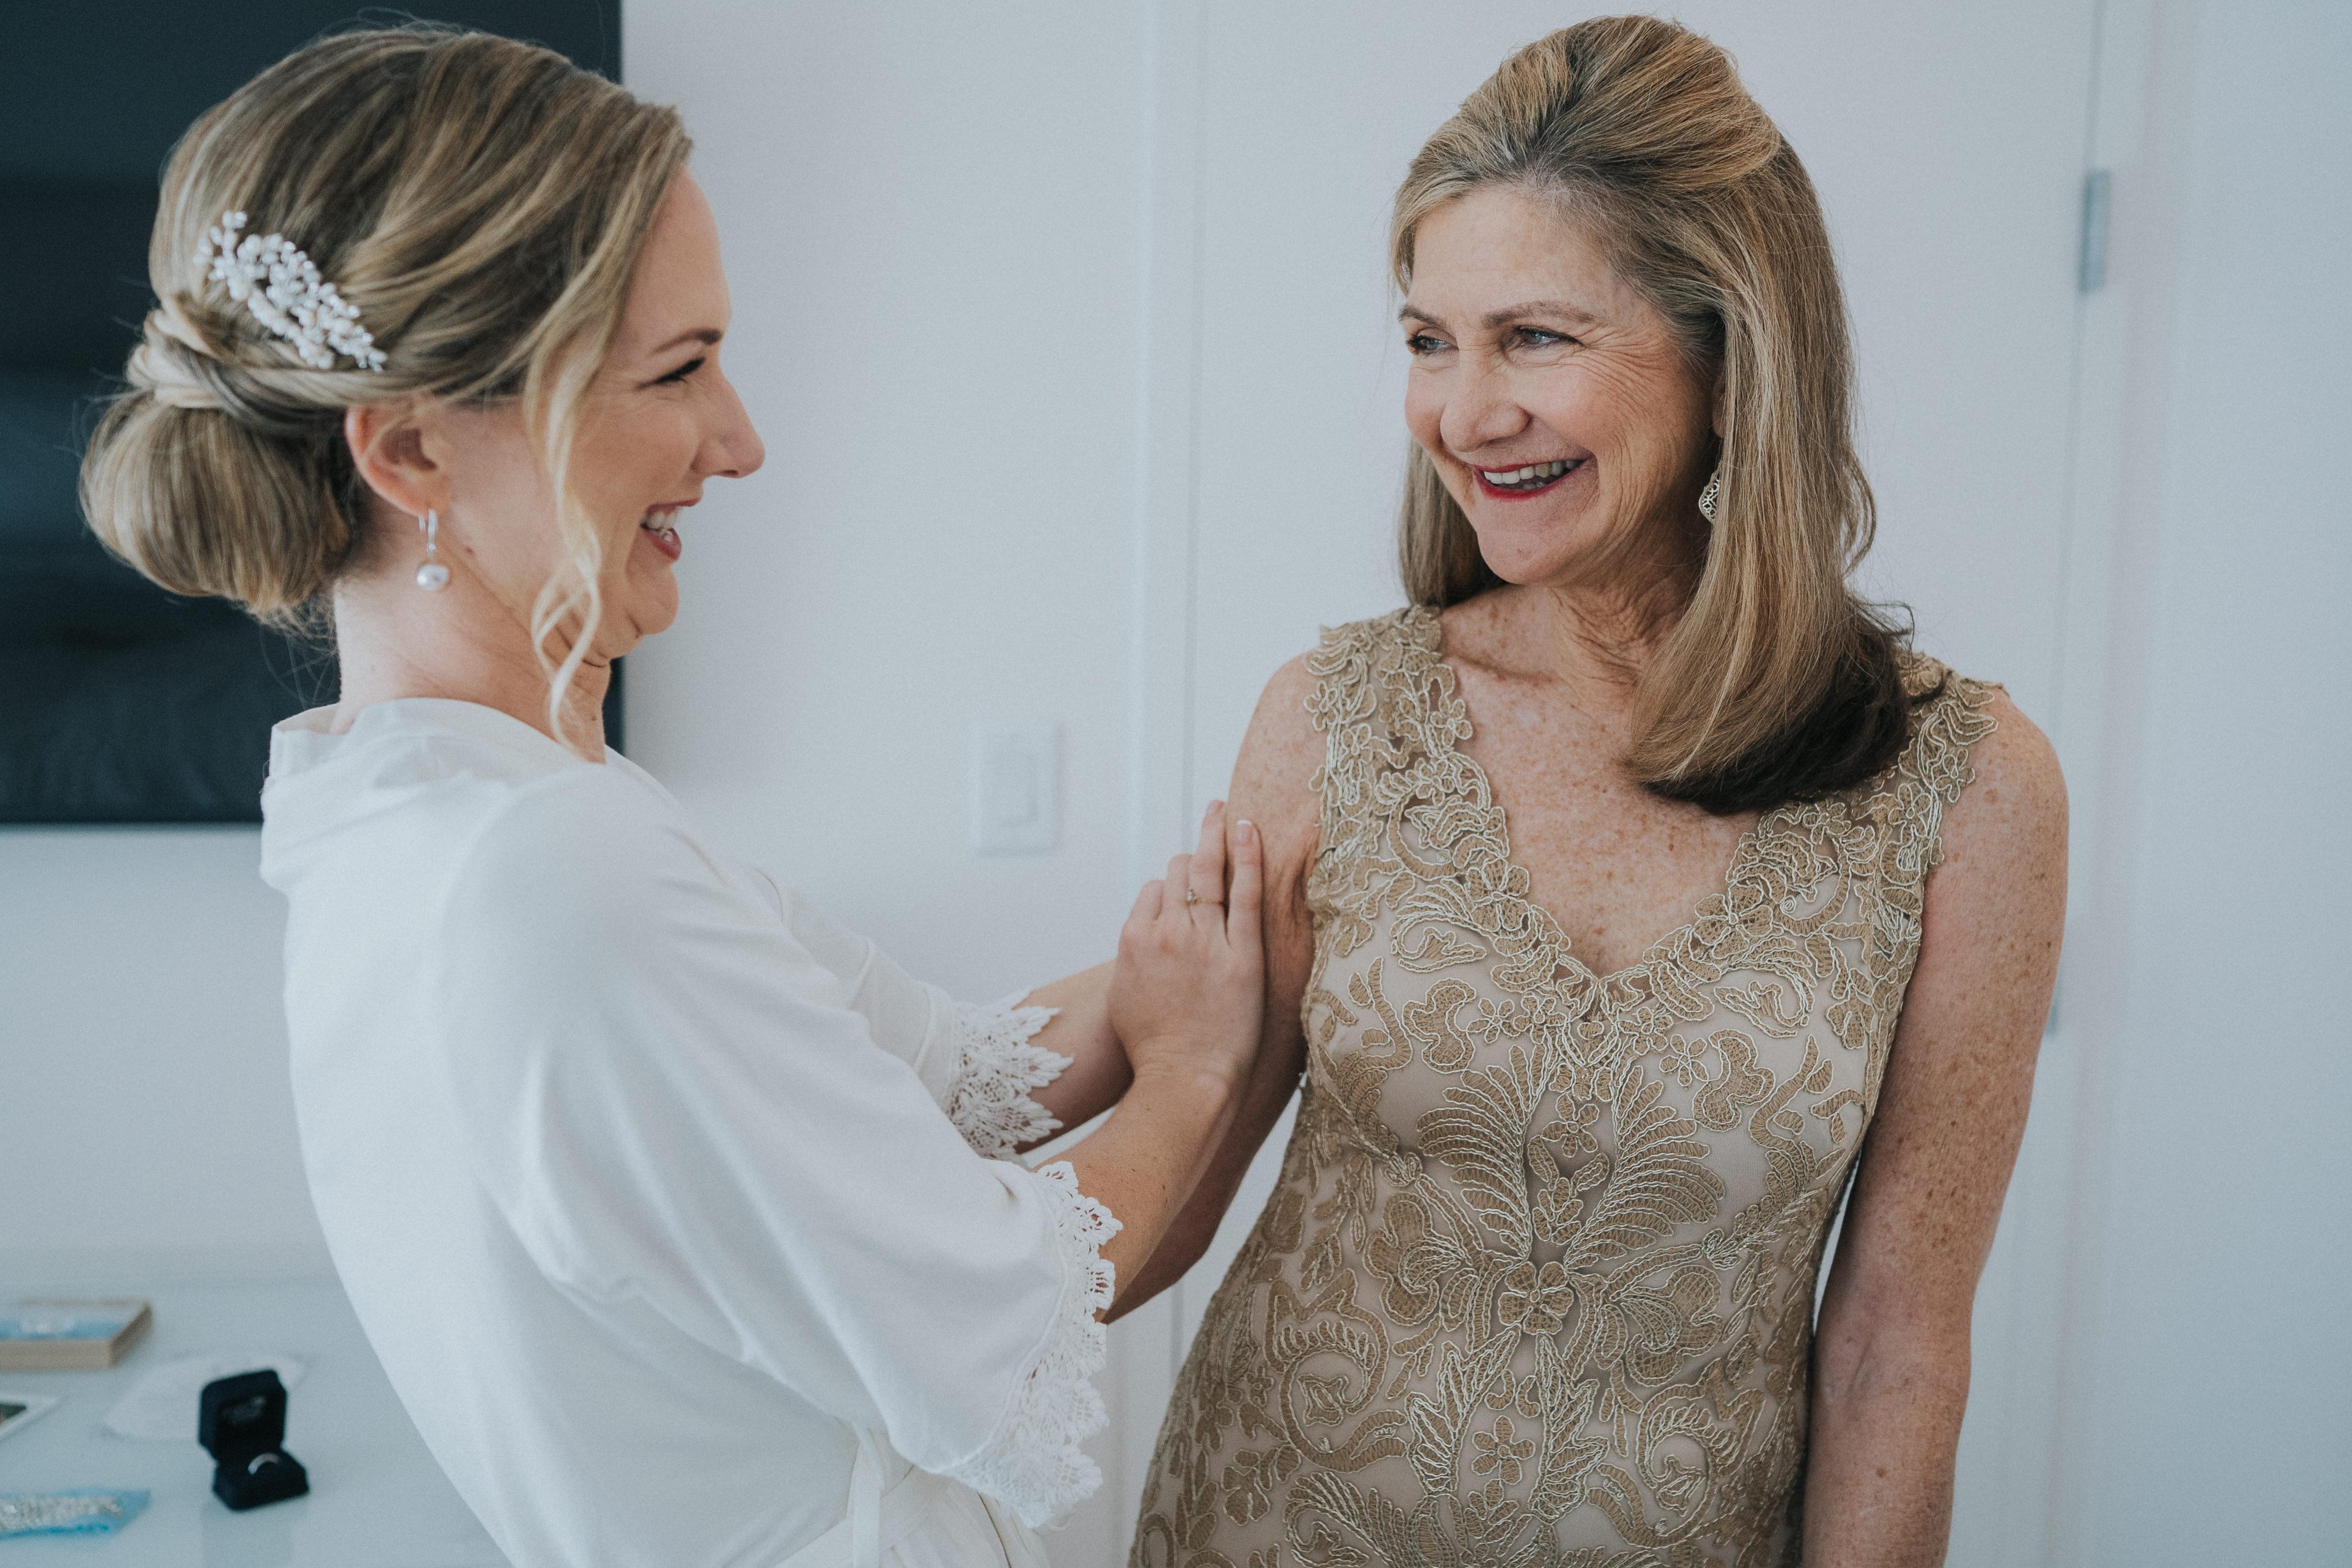 absolute wedding: savannah and carey, villa vecchia - The Absolute Event